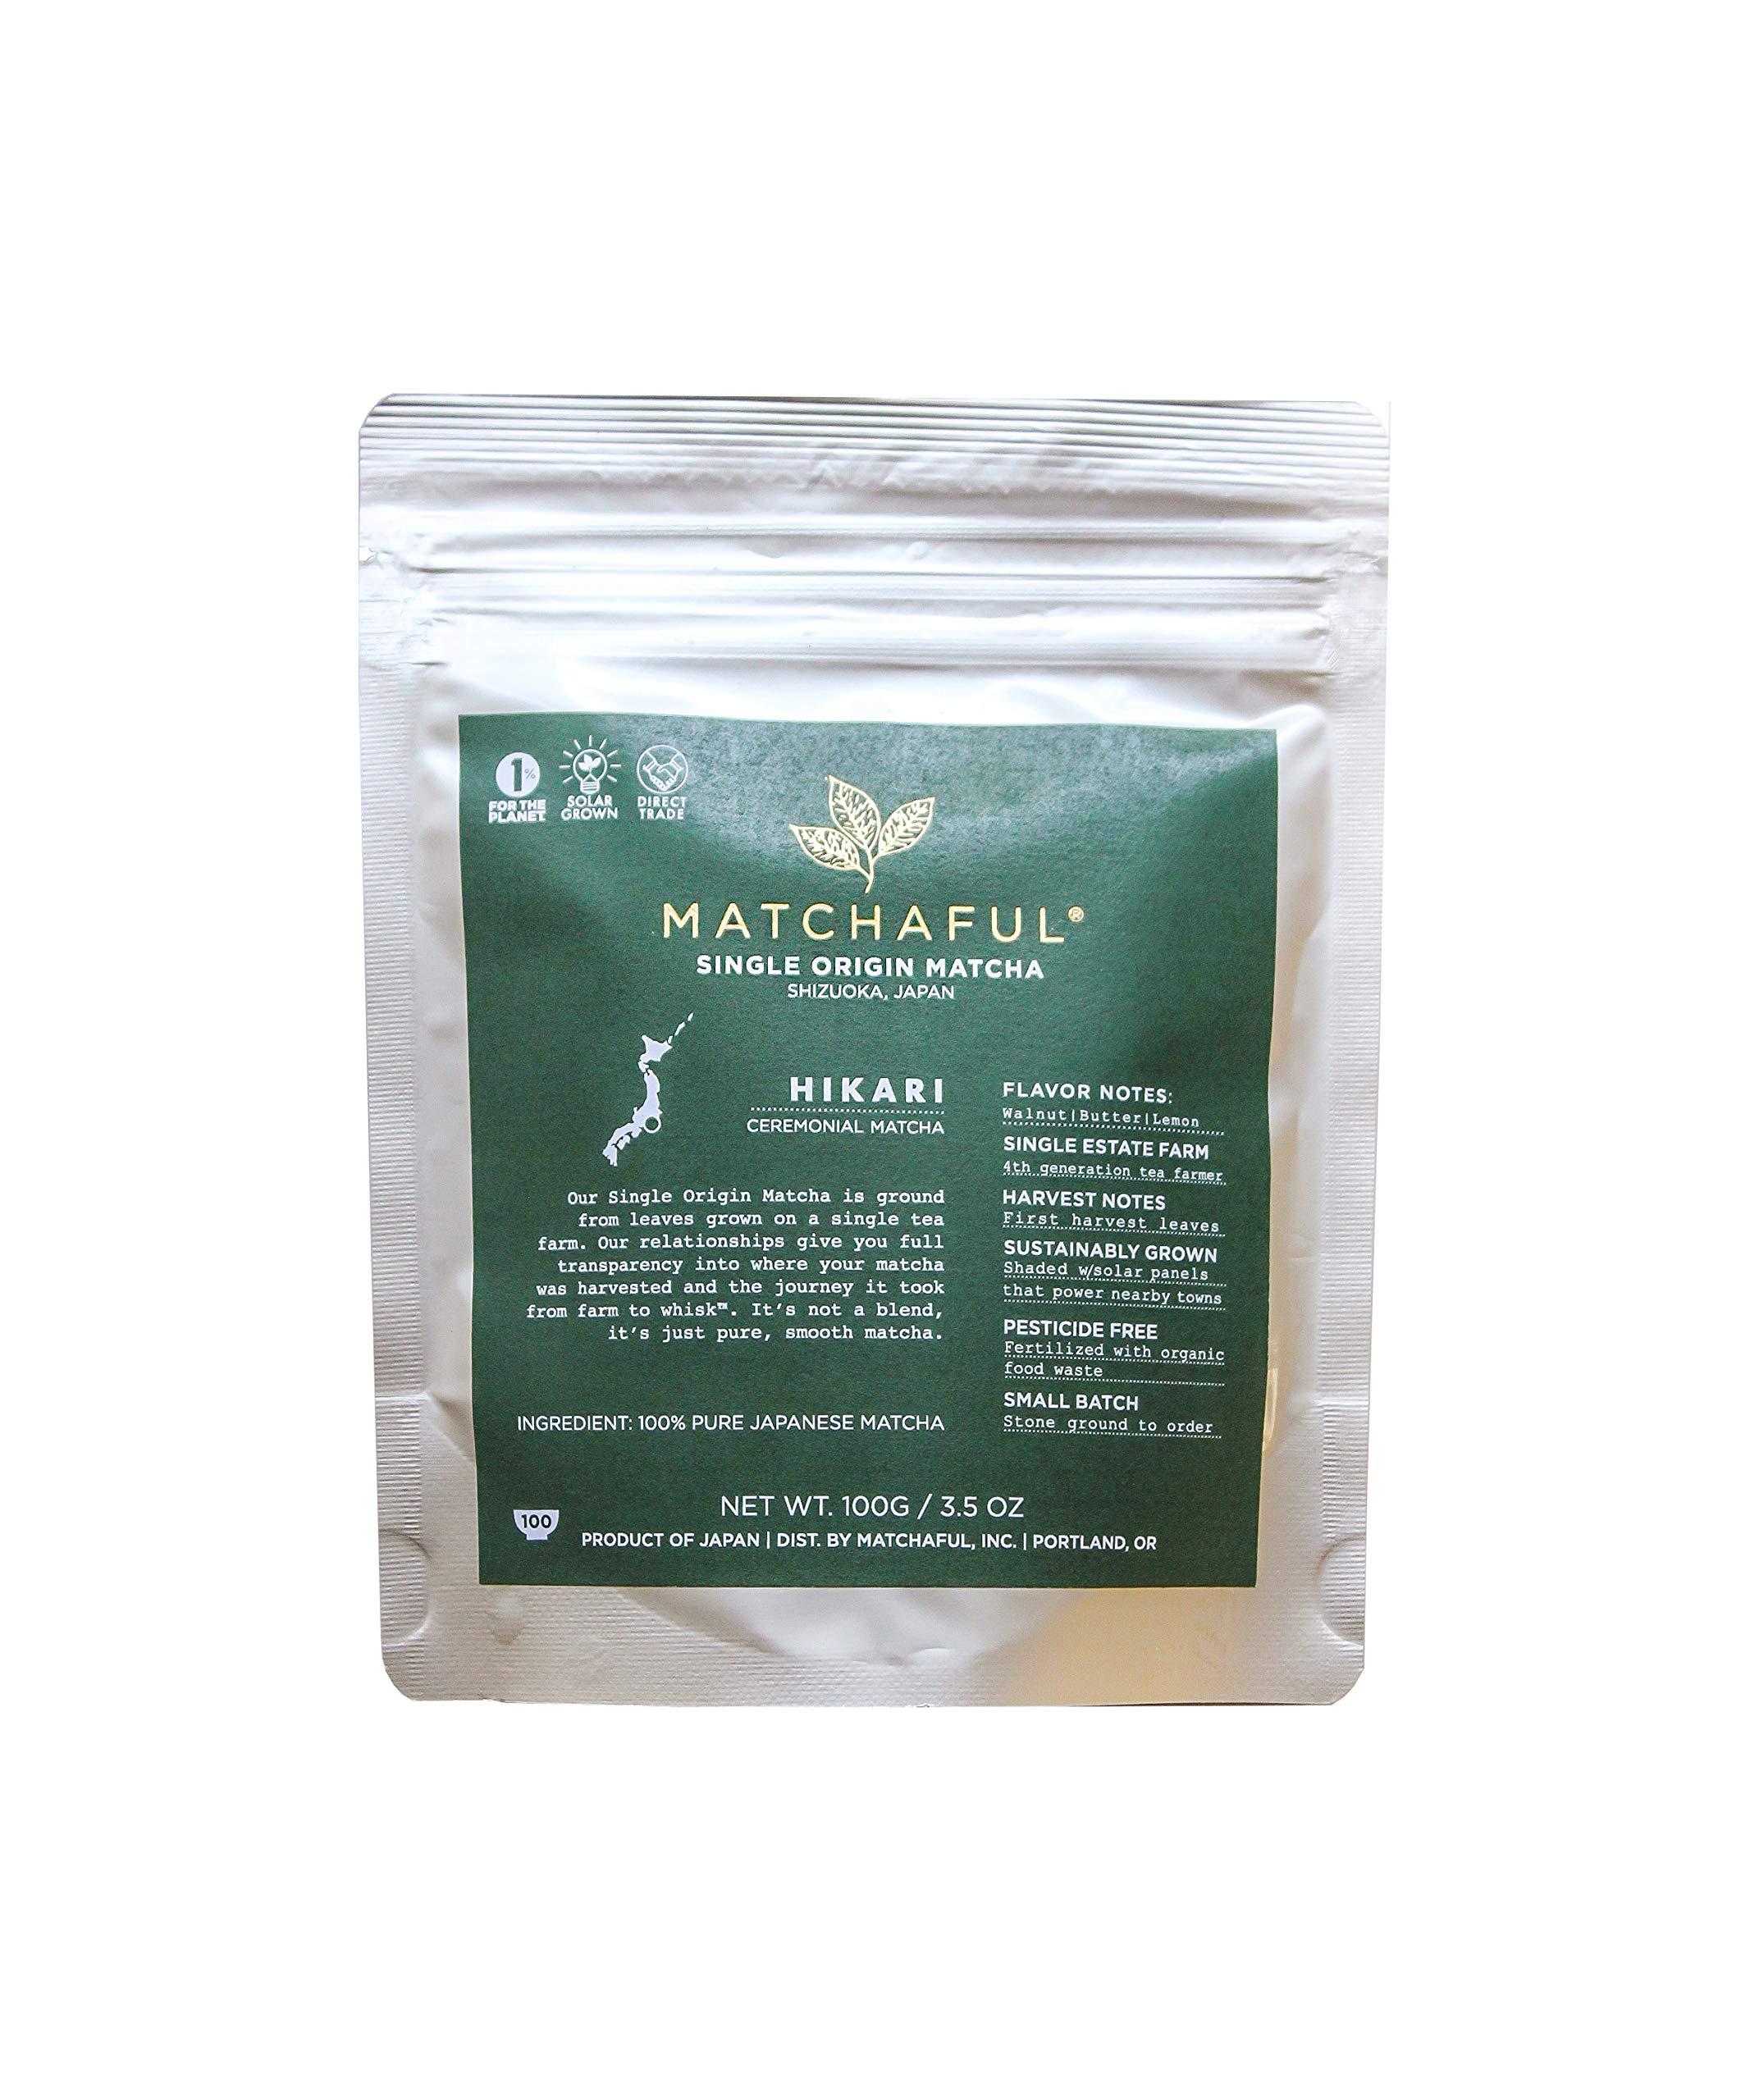 MATCHAFUL Hikari Single Origin Organic Ceremonial Matcha, 100 Gram